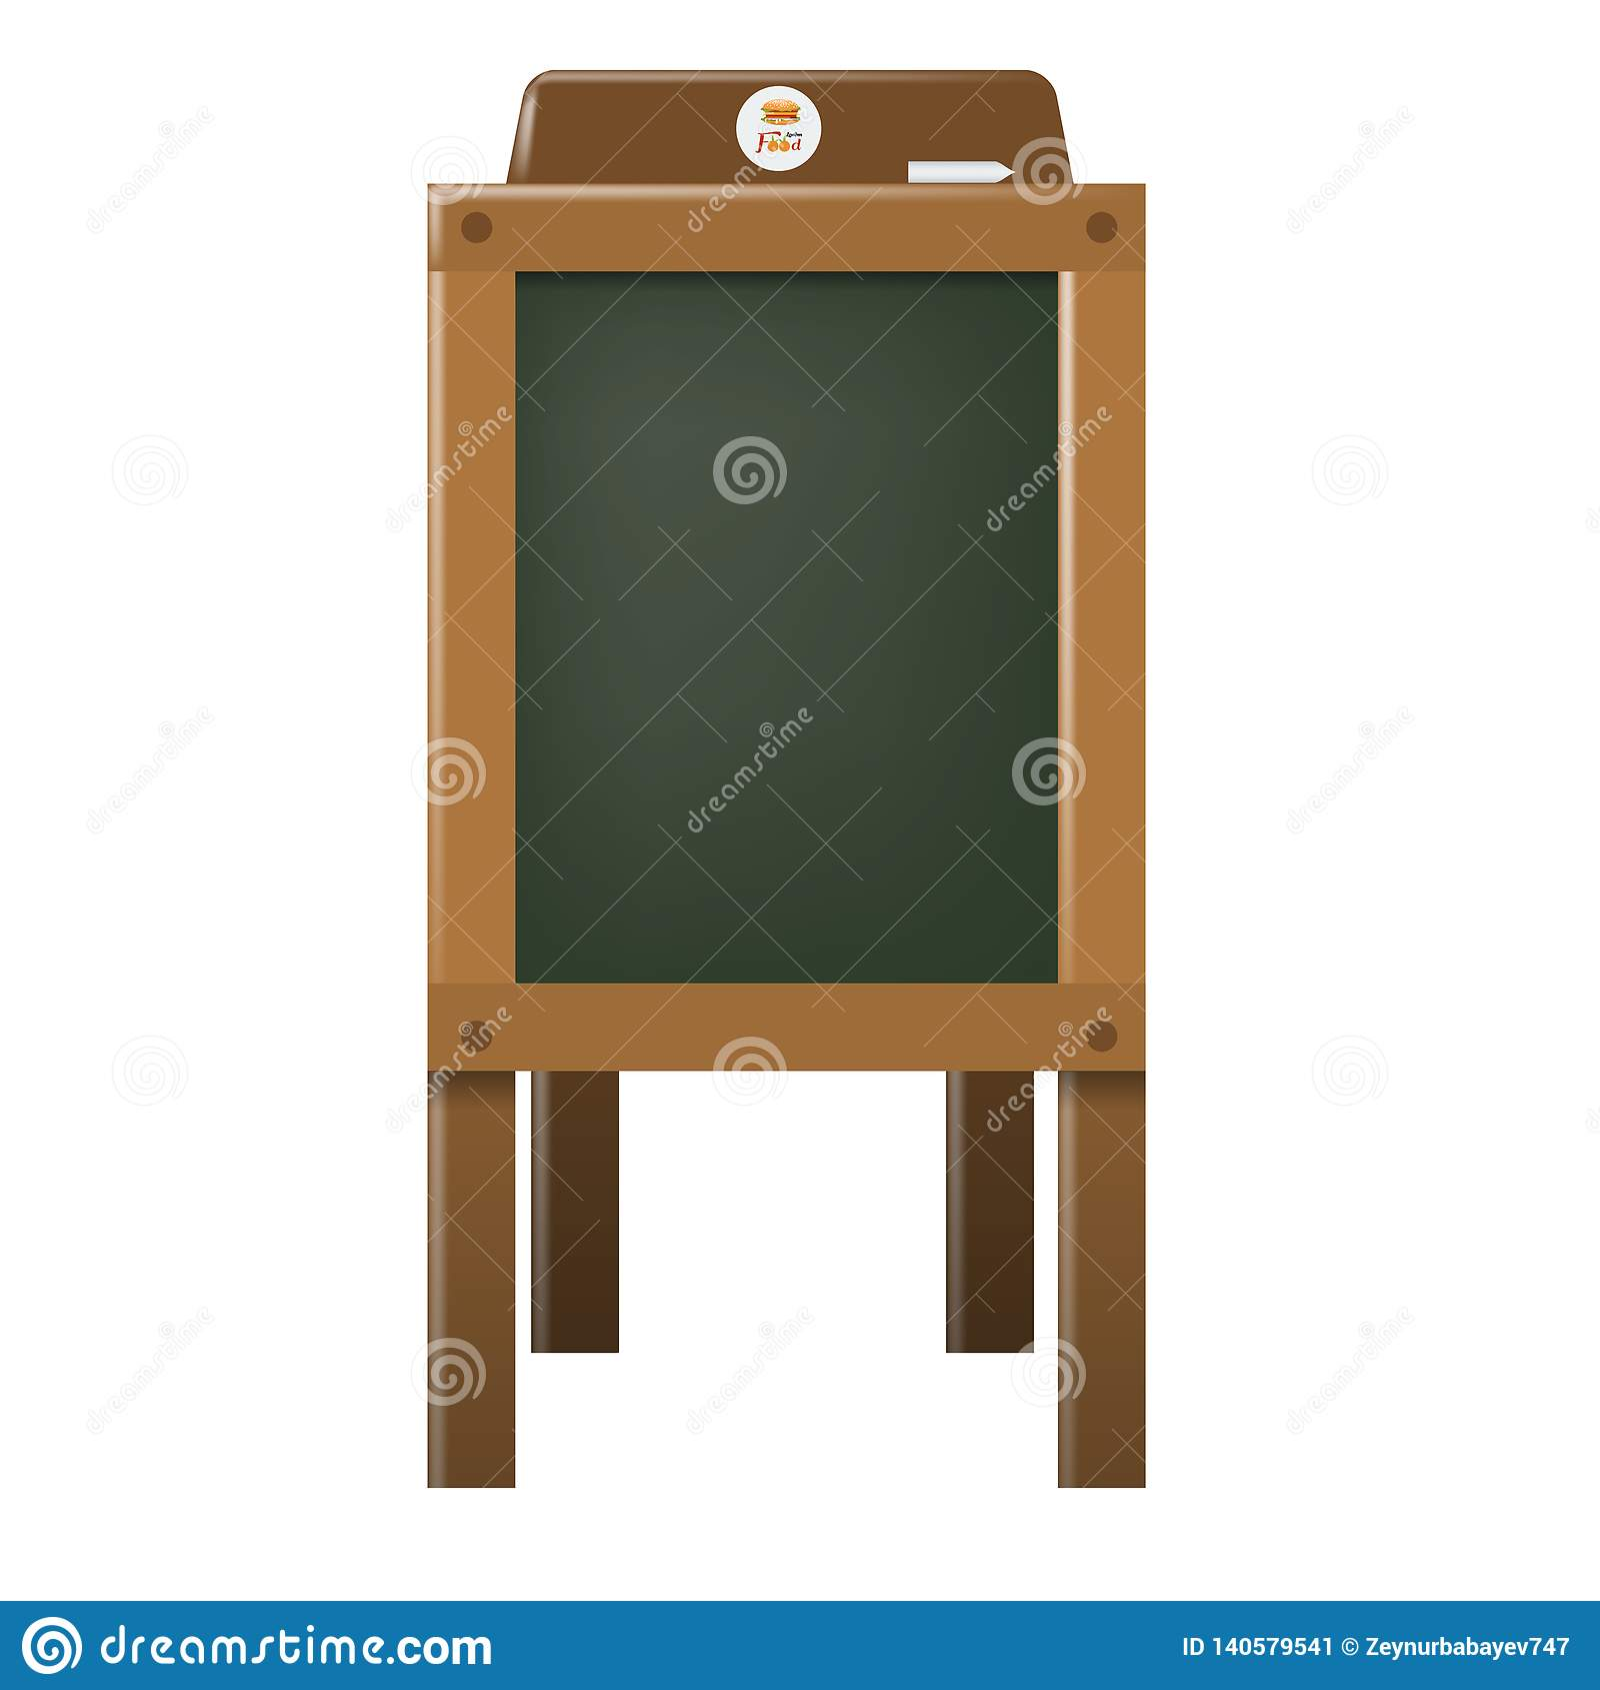 Board Coffee Menu Shop Stock Illustrations 1 824 Board Coffee Menu Shop Stock Illustrations Vectors Clipart Dreamstime